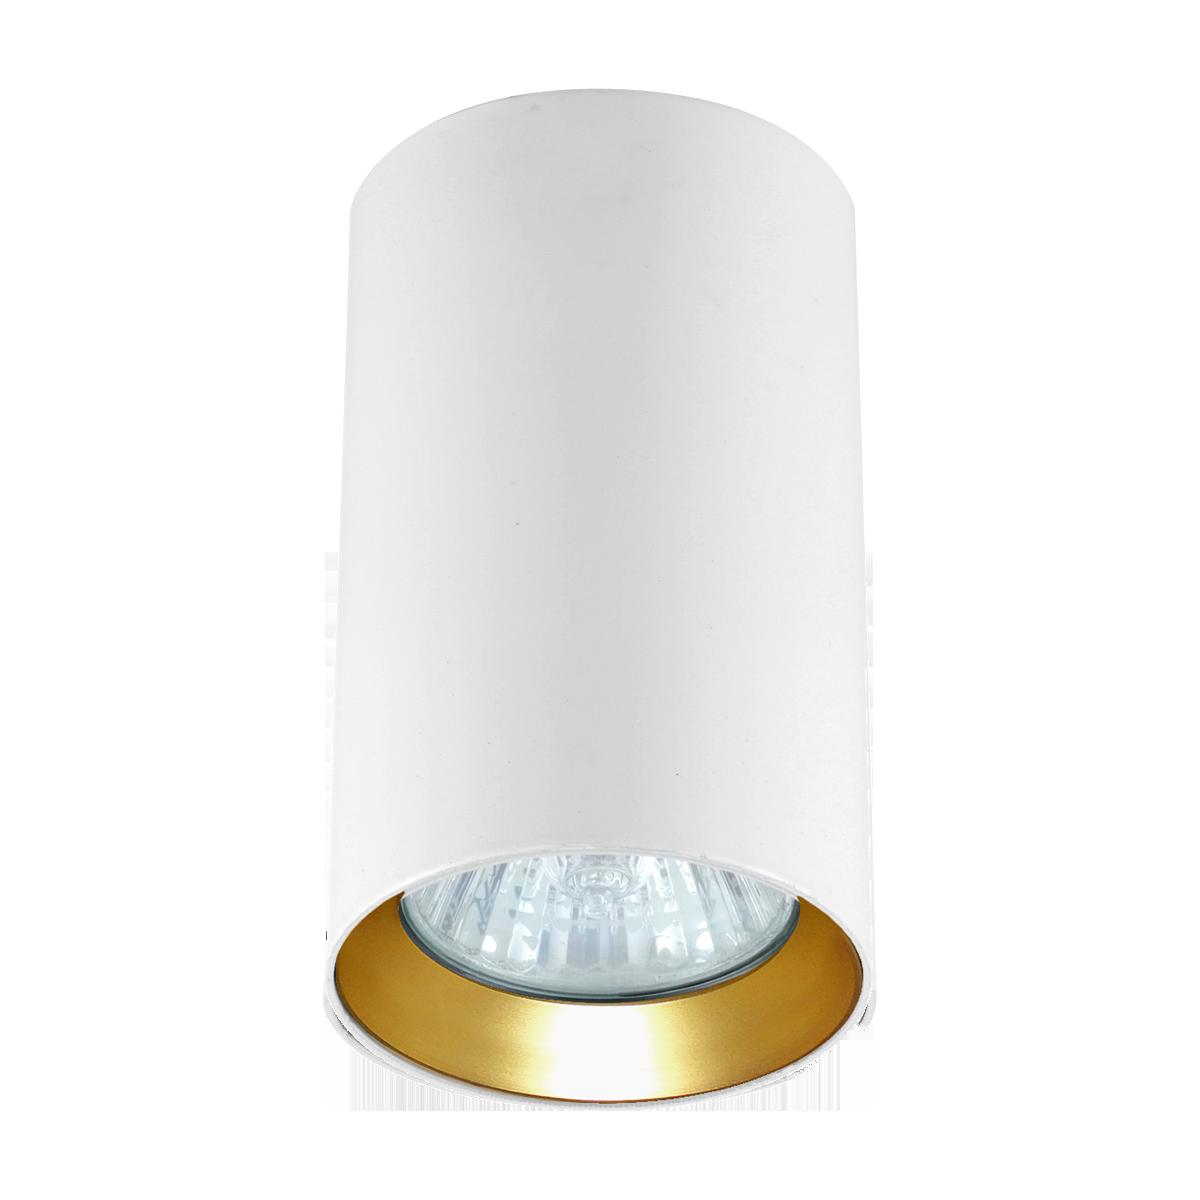 Downlight MANACOR 9 GU10 -złoty ring